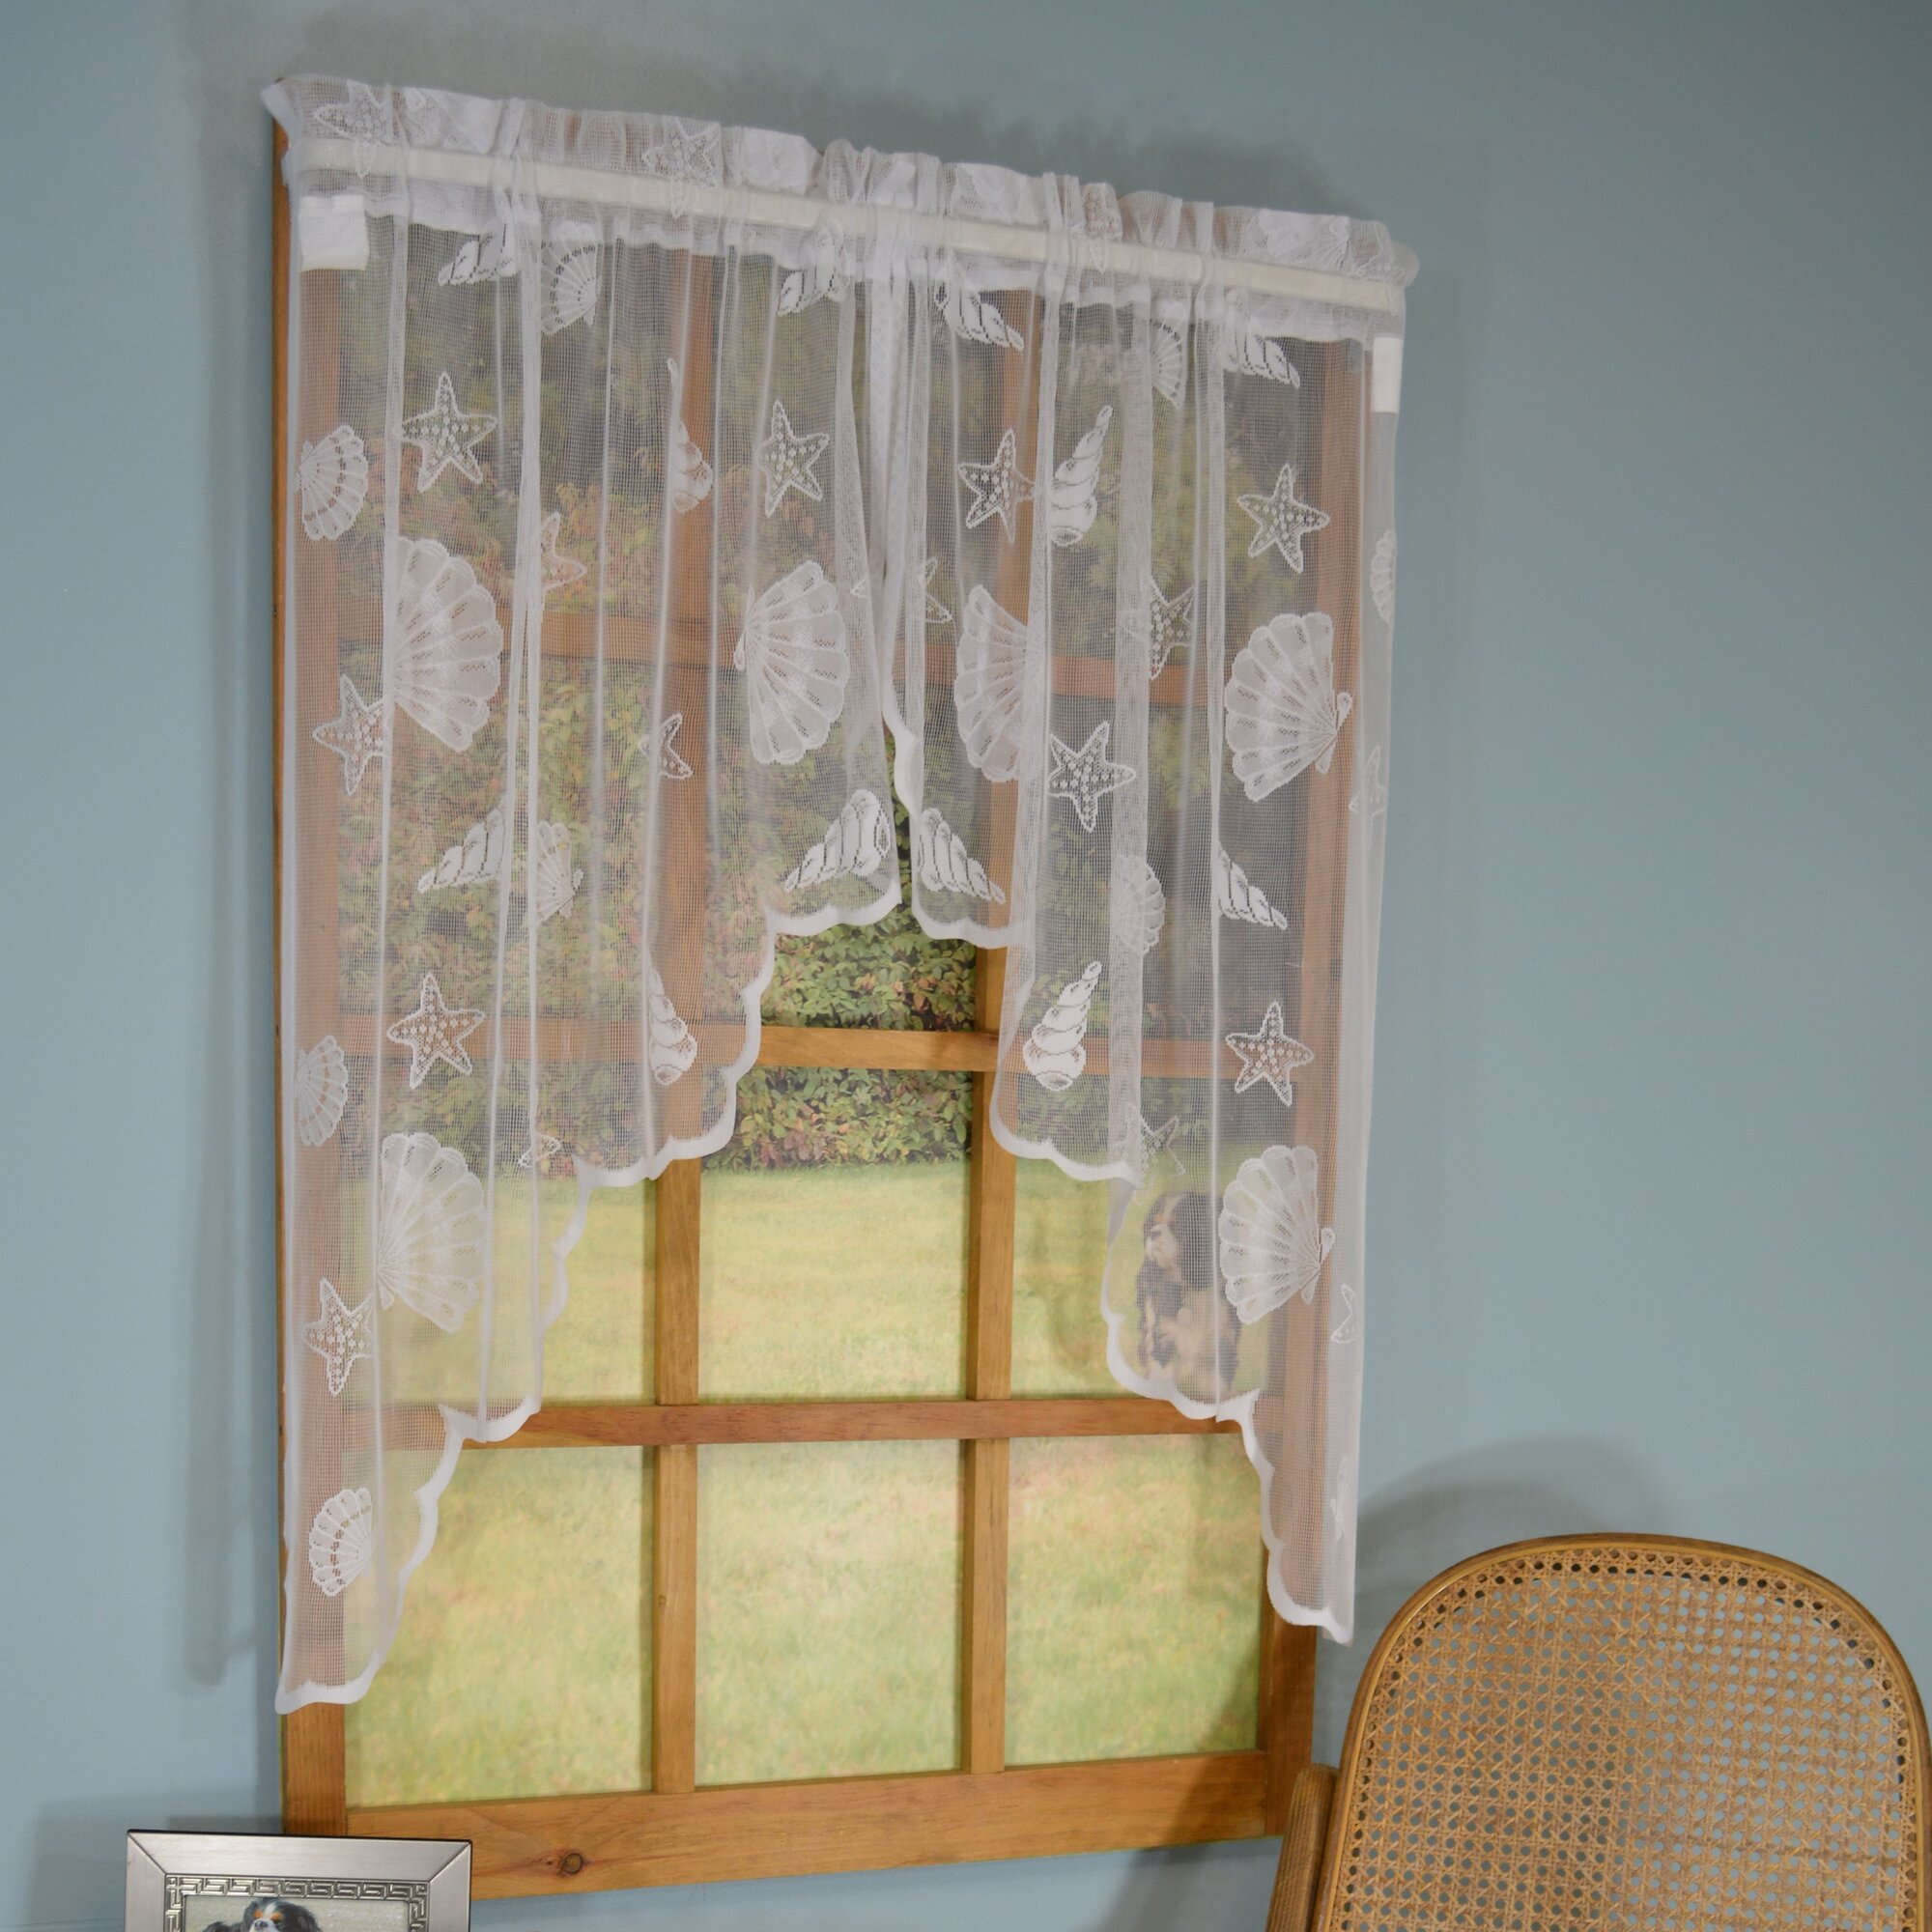 Curtain Chic Seashell Lace Nautical Sheer Rod Pocket